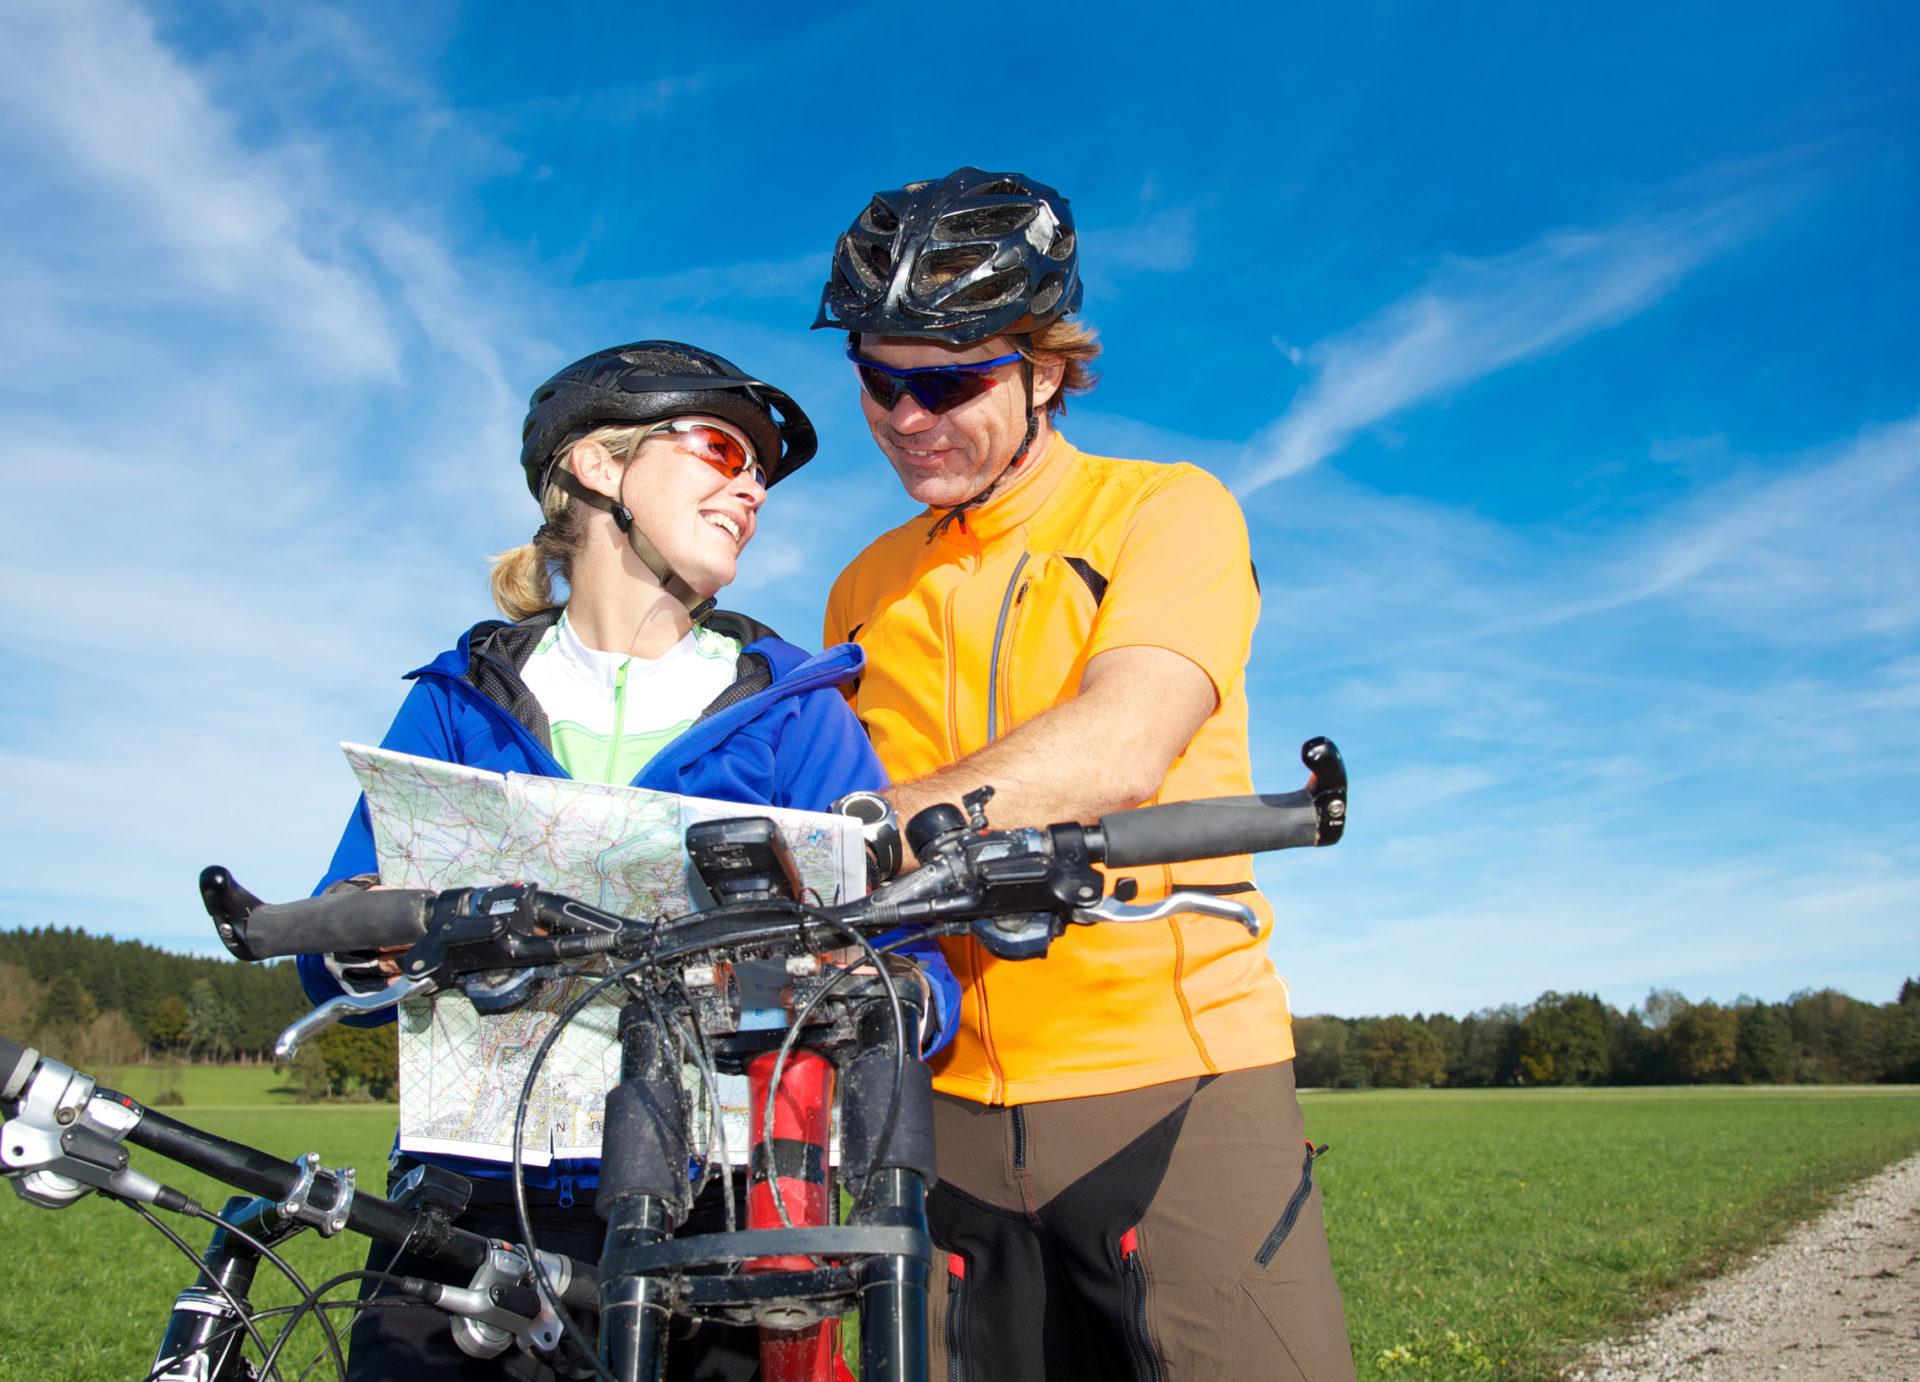 Paar auf Mountainbike Tour © grafikplusfoto/Fotolia